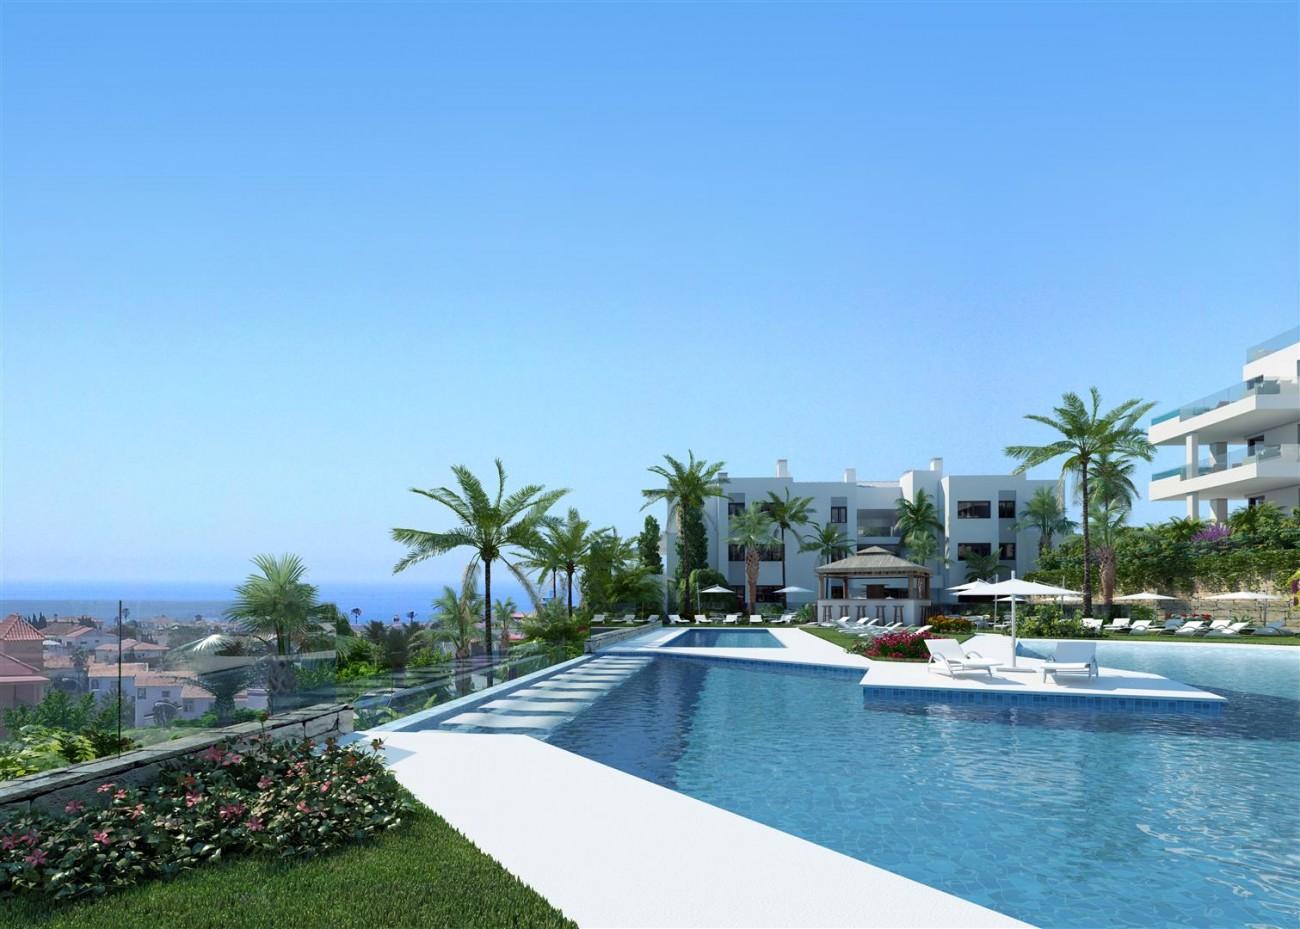 New Contemporary Development for sale Mijas Costa Spain (8) (Large)